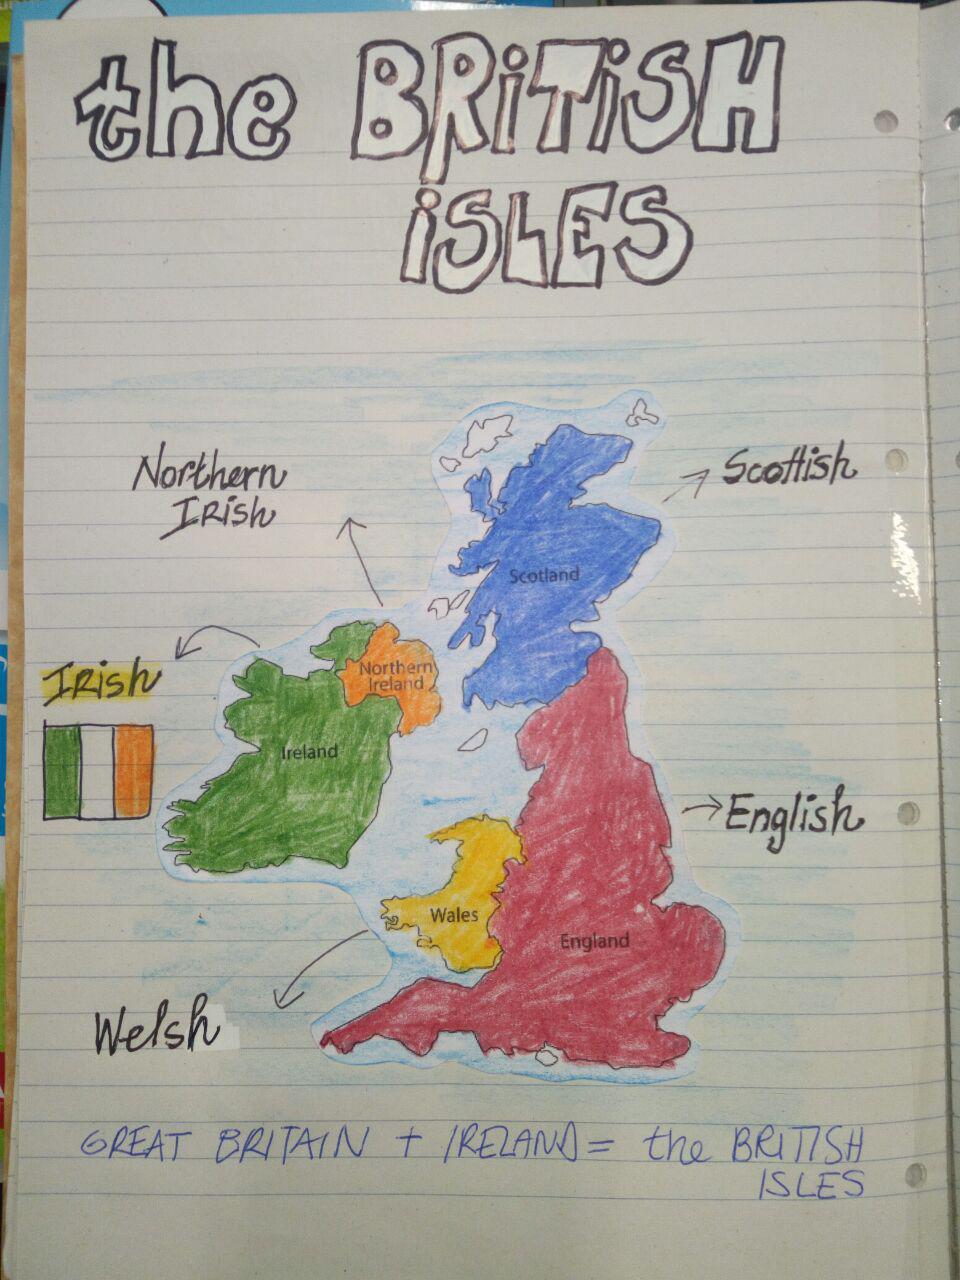 Cartina Inghilterra Per Bambini.The British Isles Clil At Primary School